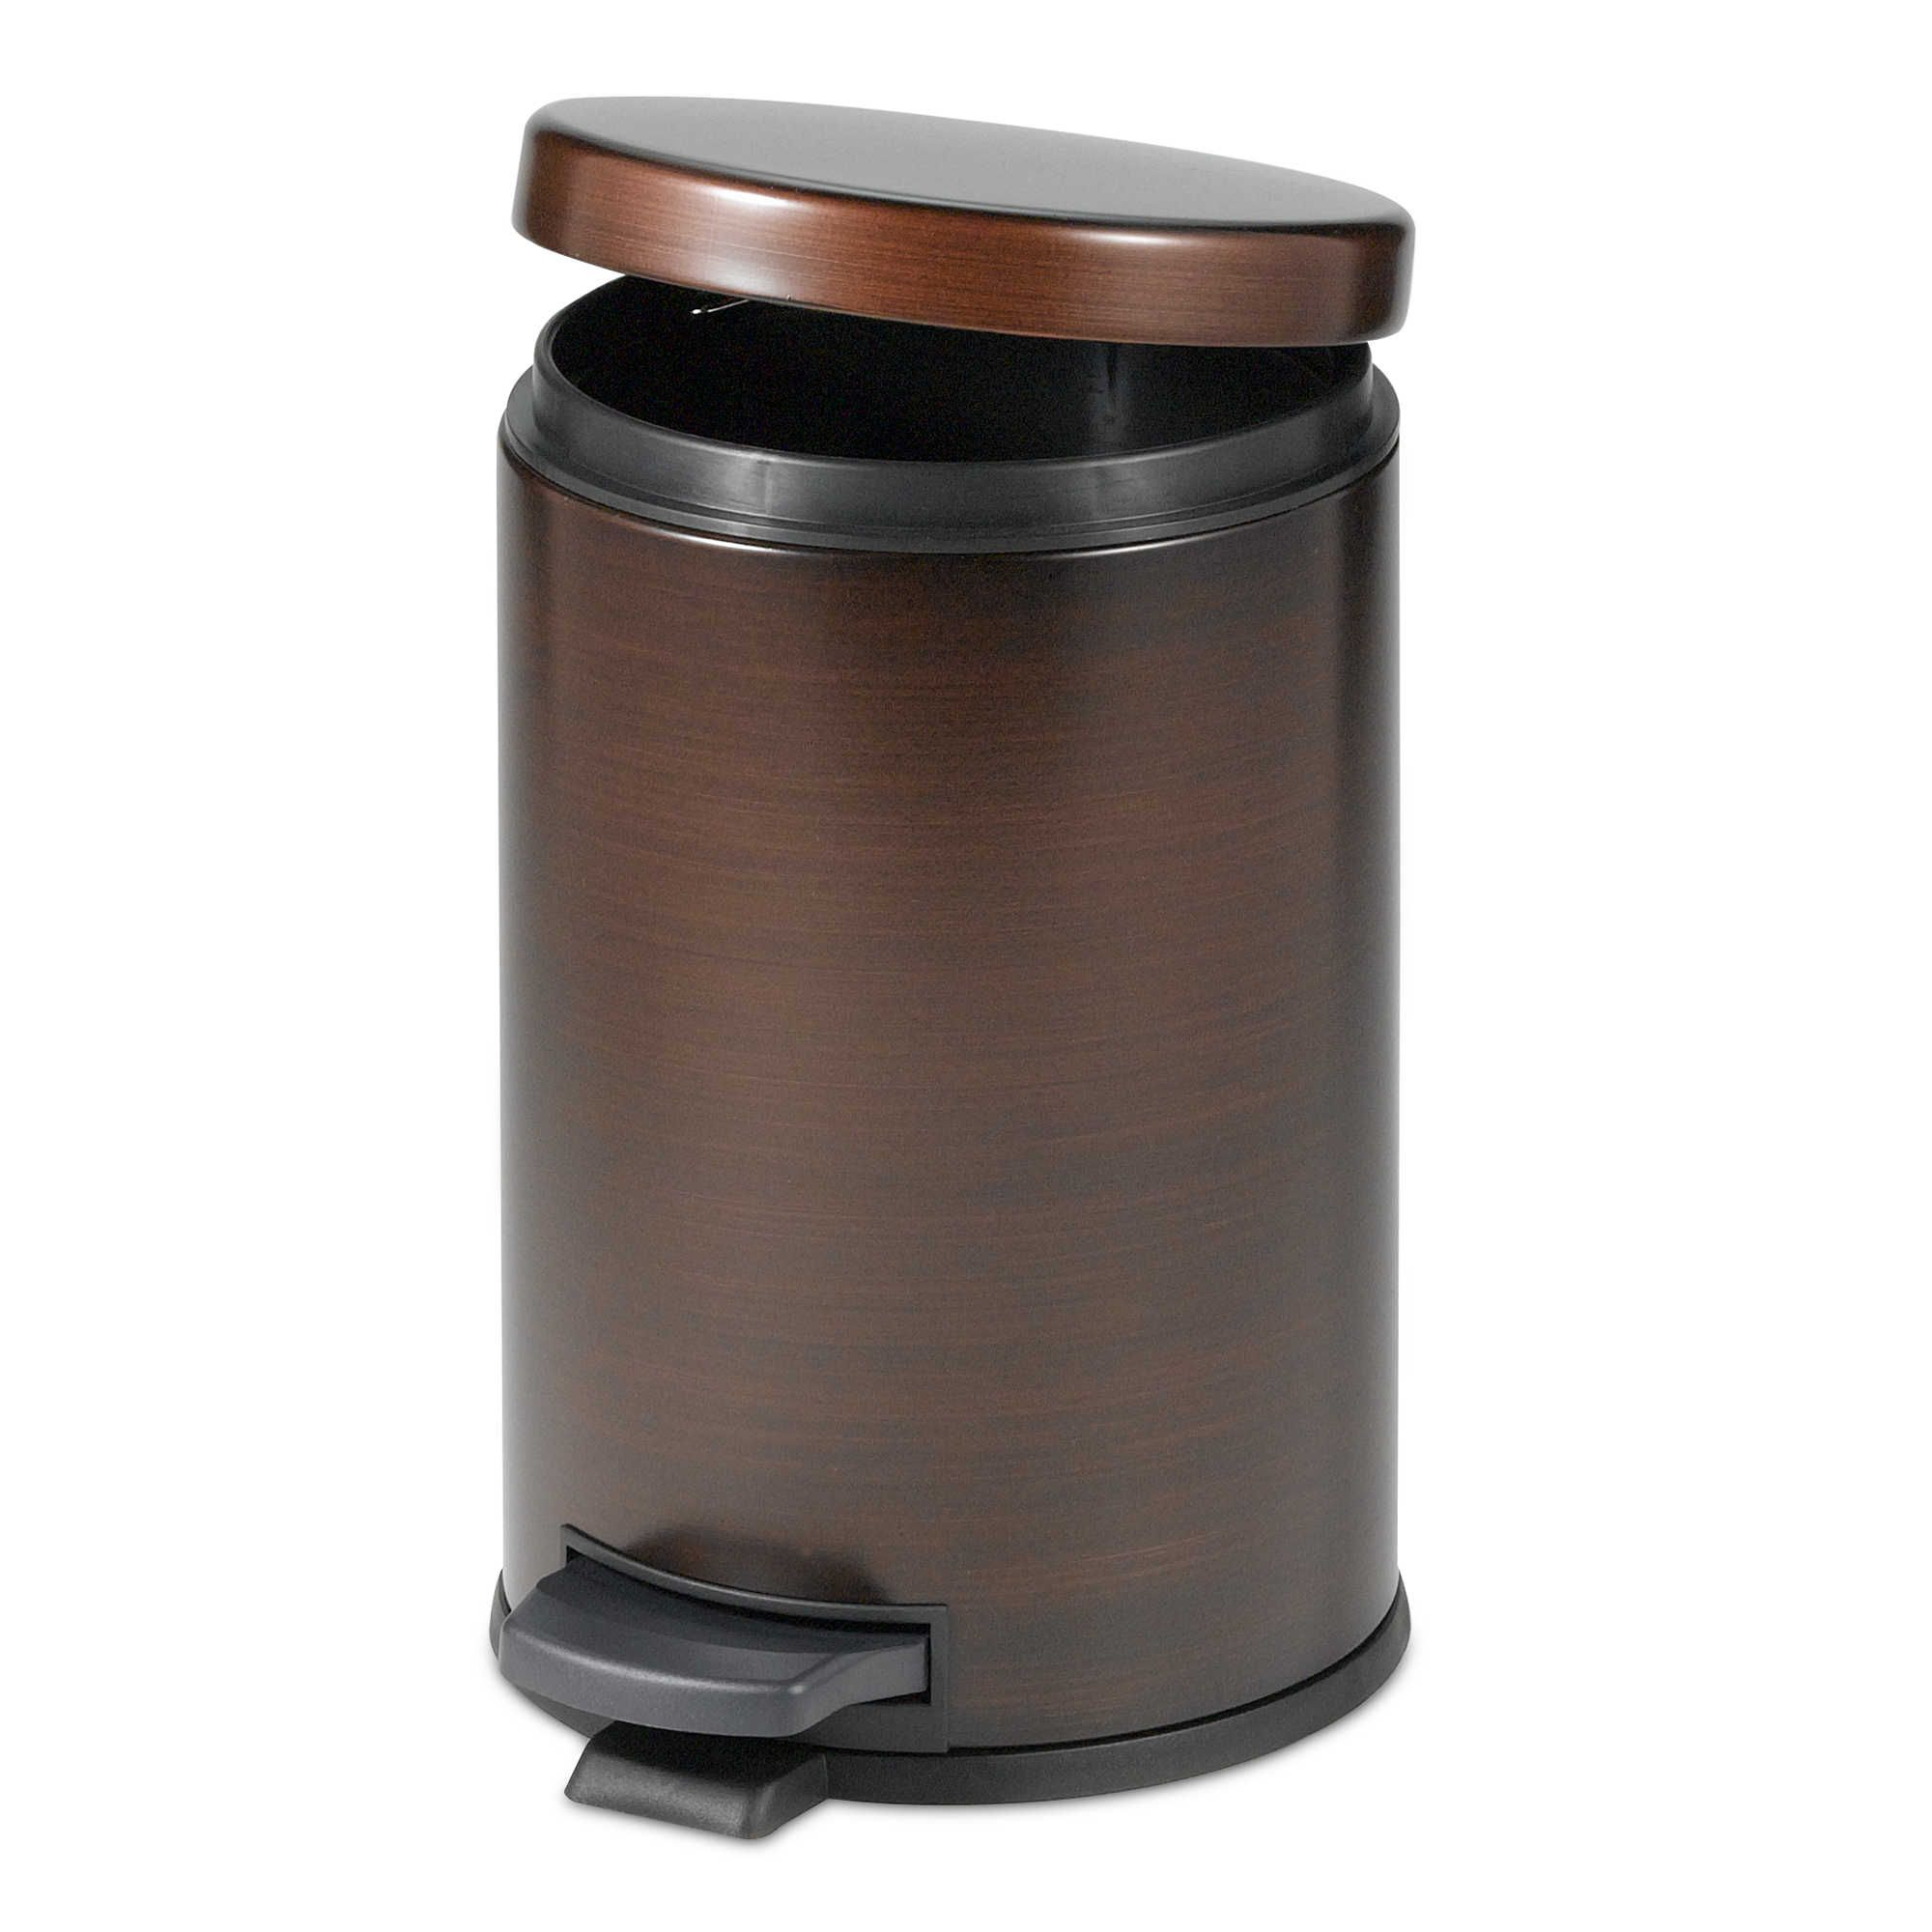 India Ink Oil Rubbed 4-1/2-Liter Bath Step On Wastebasket in ...